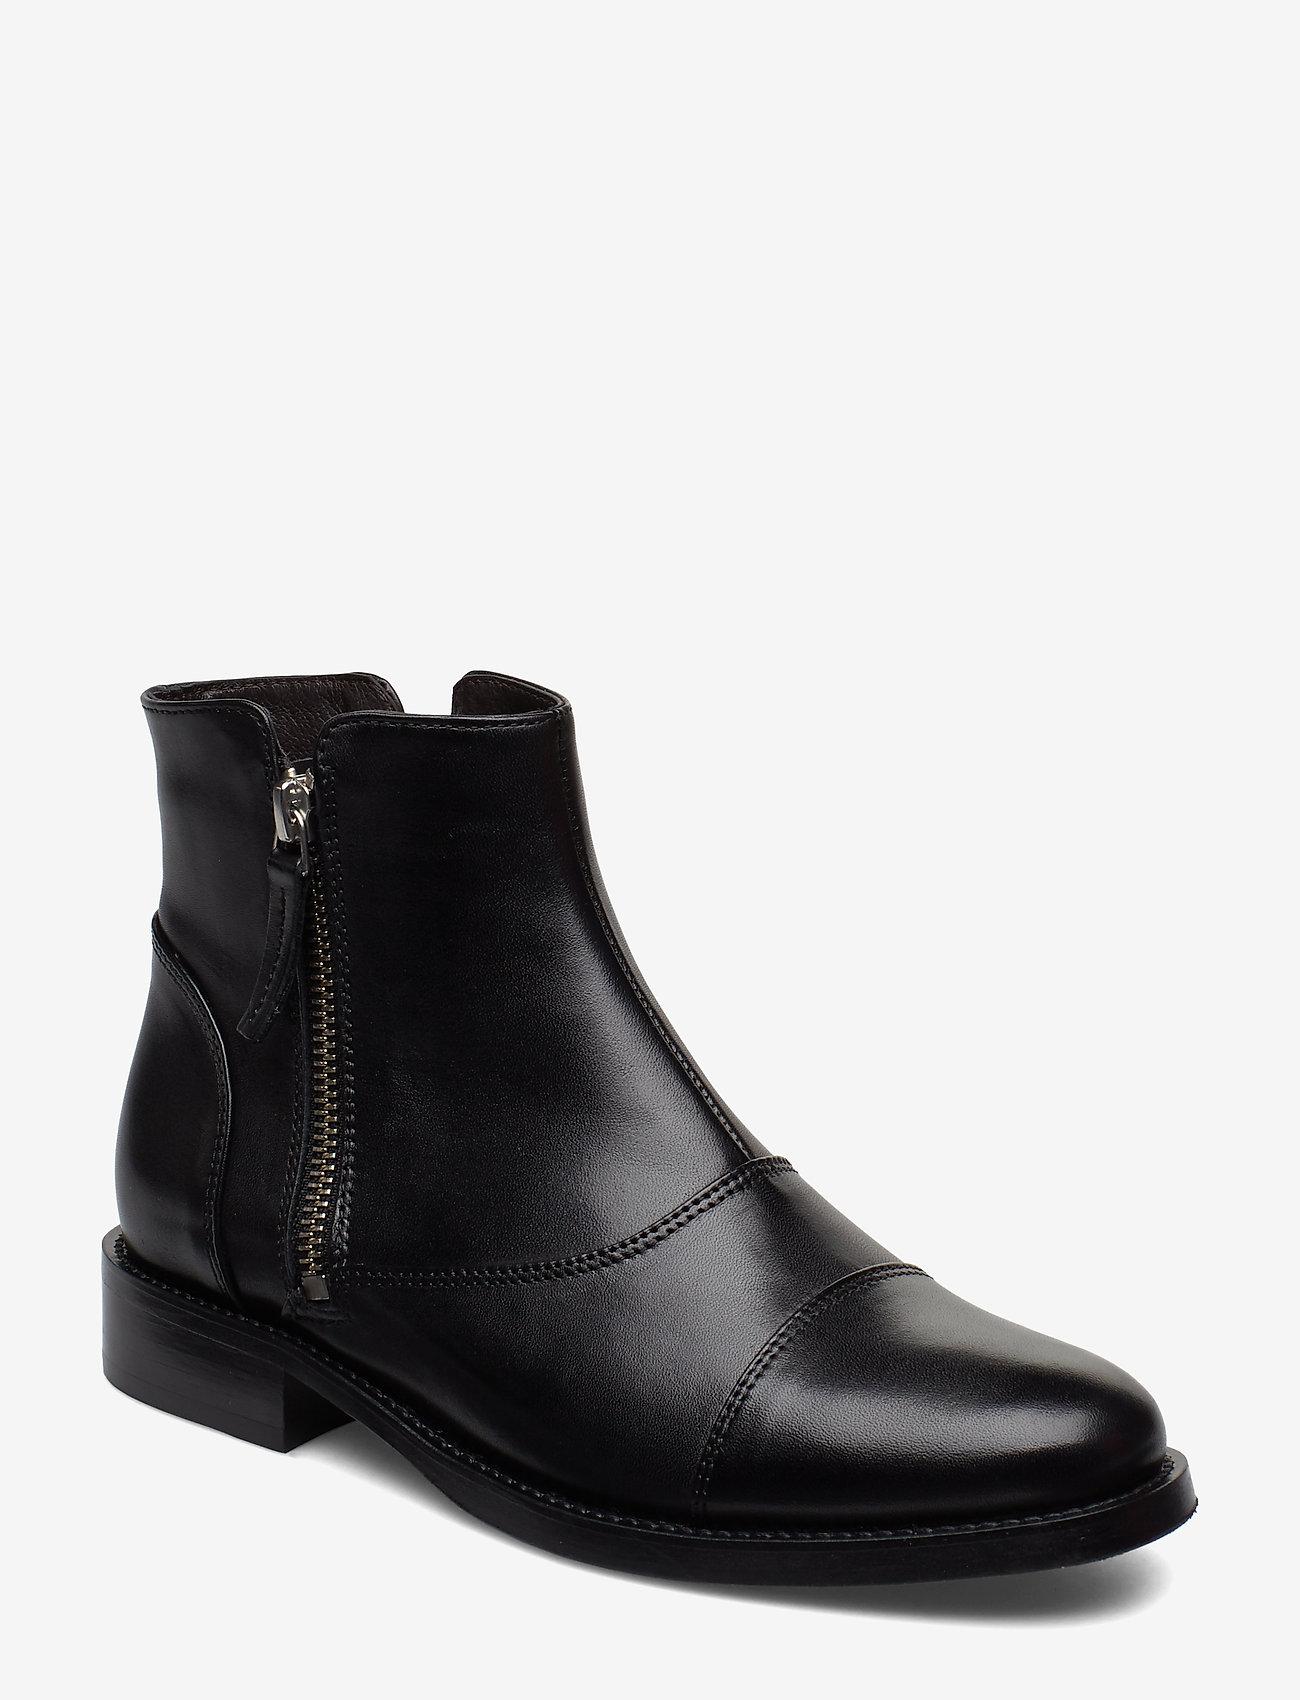 Billi Bi - BOOTS - flate ankelstøvletter - black calf/silver 603 - 0